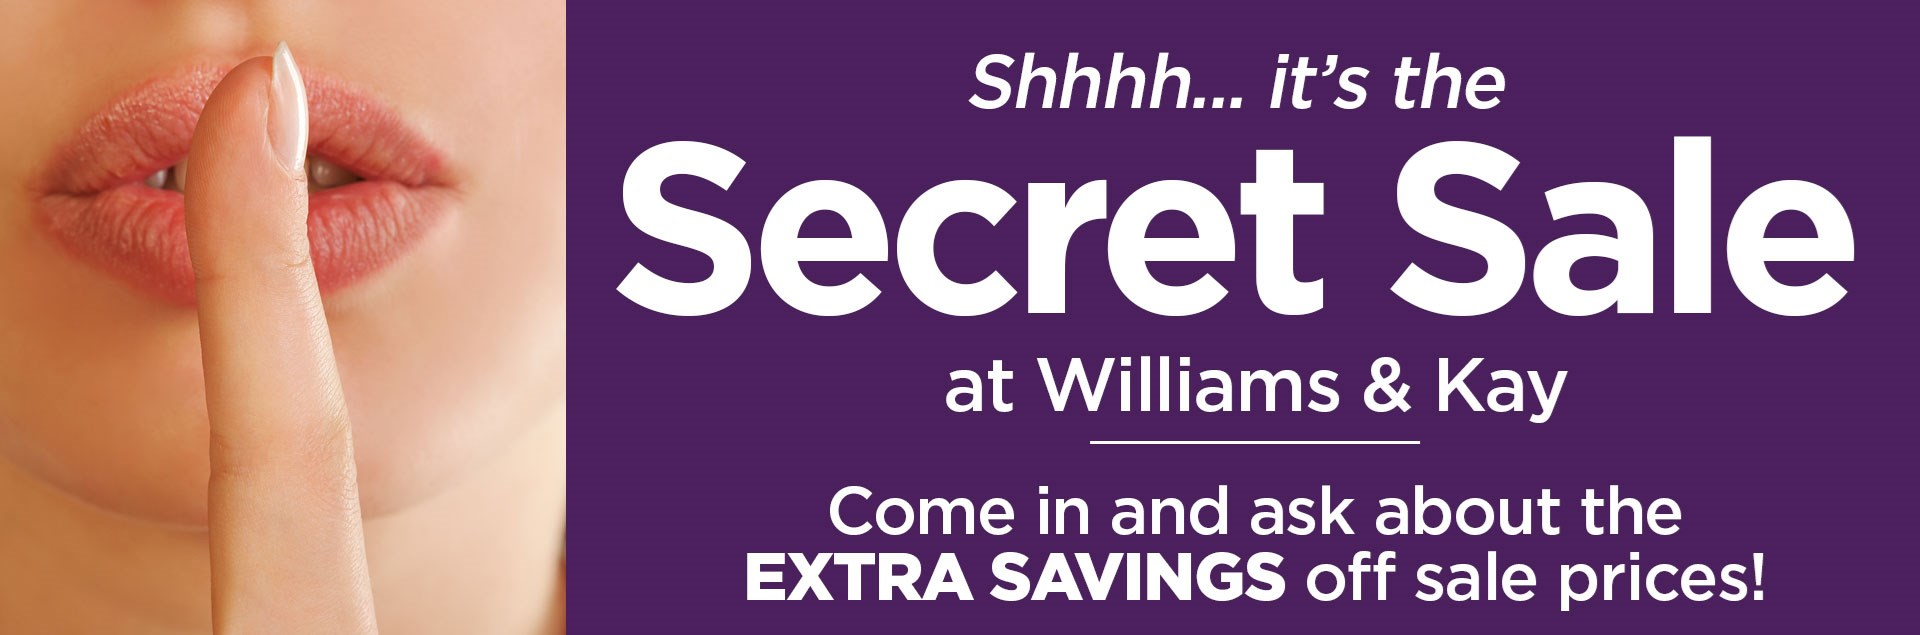 WK Secret Sale